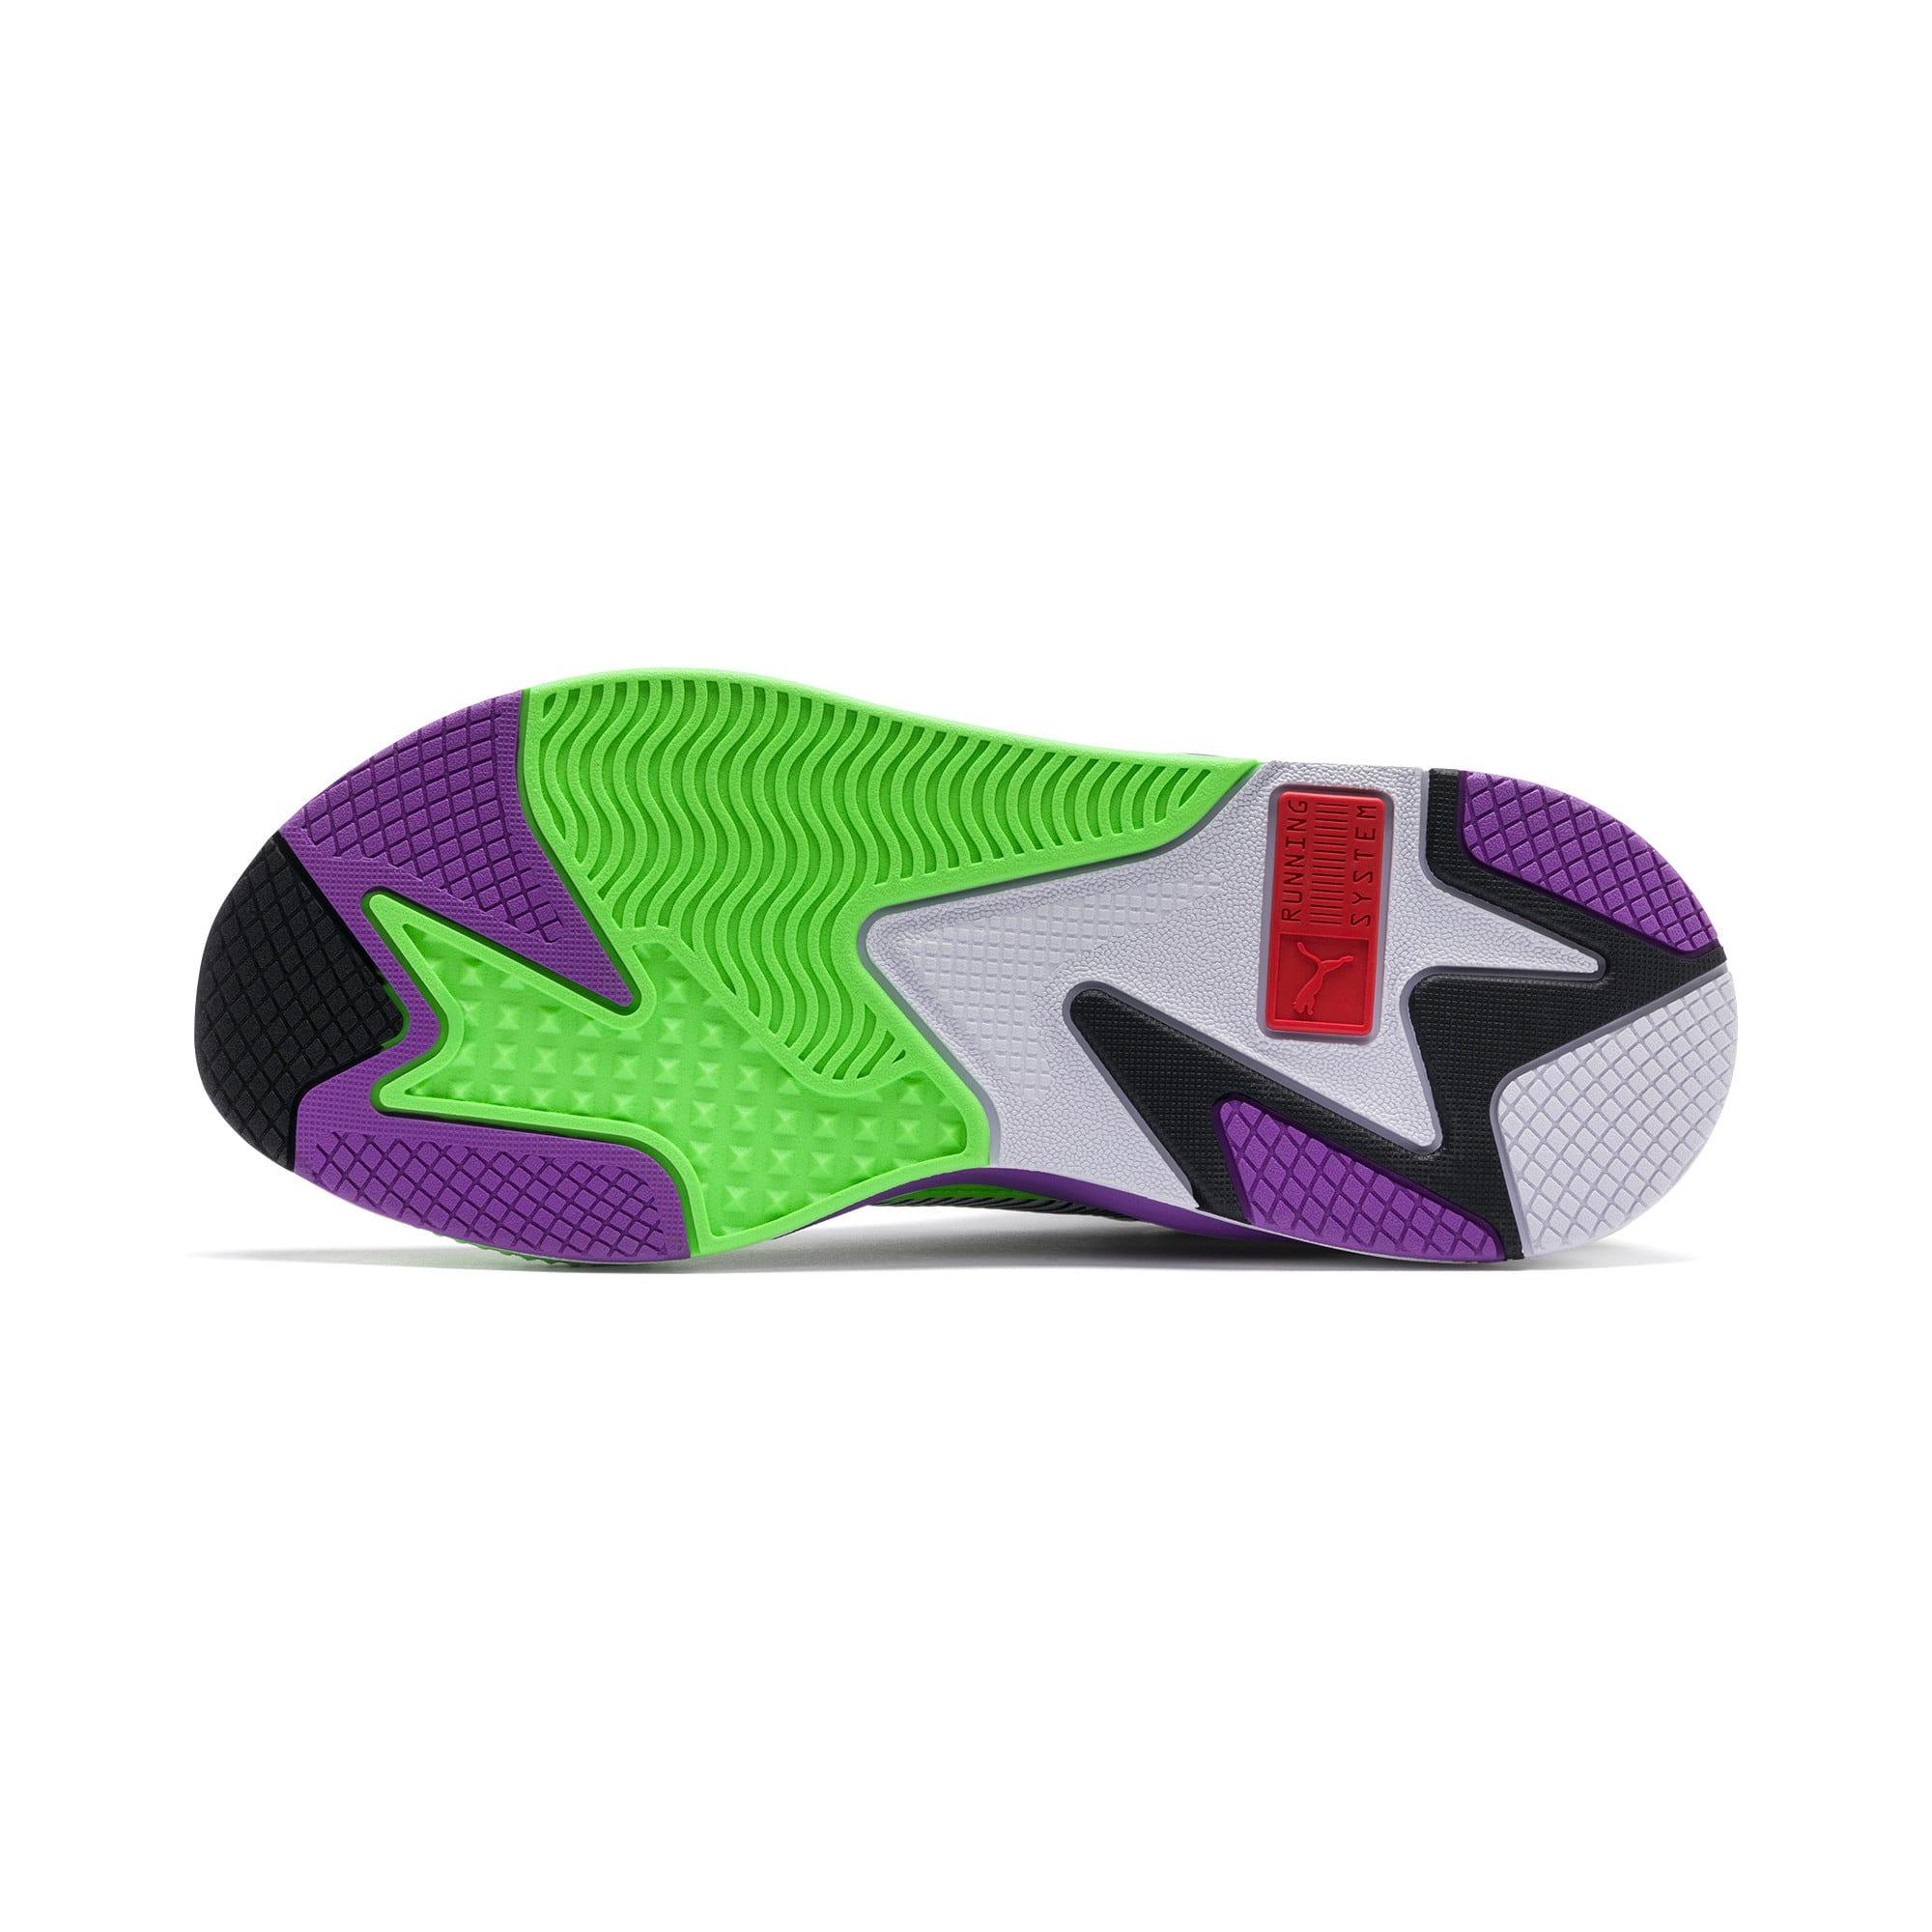 Thumbnail 4 of RS-X Bold Trainers, PWhite-Gr Gecko-Royal Lilac, medium